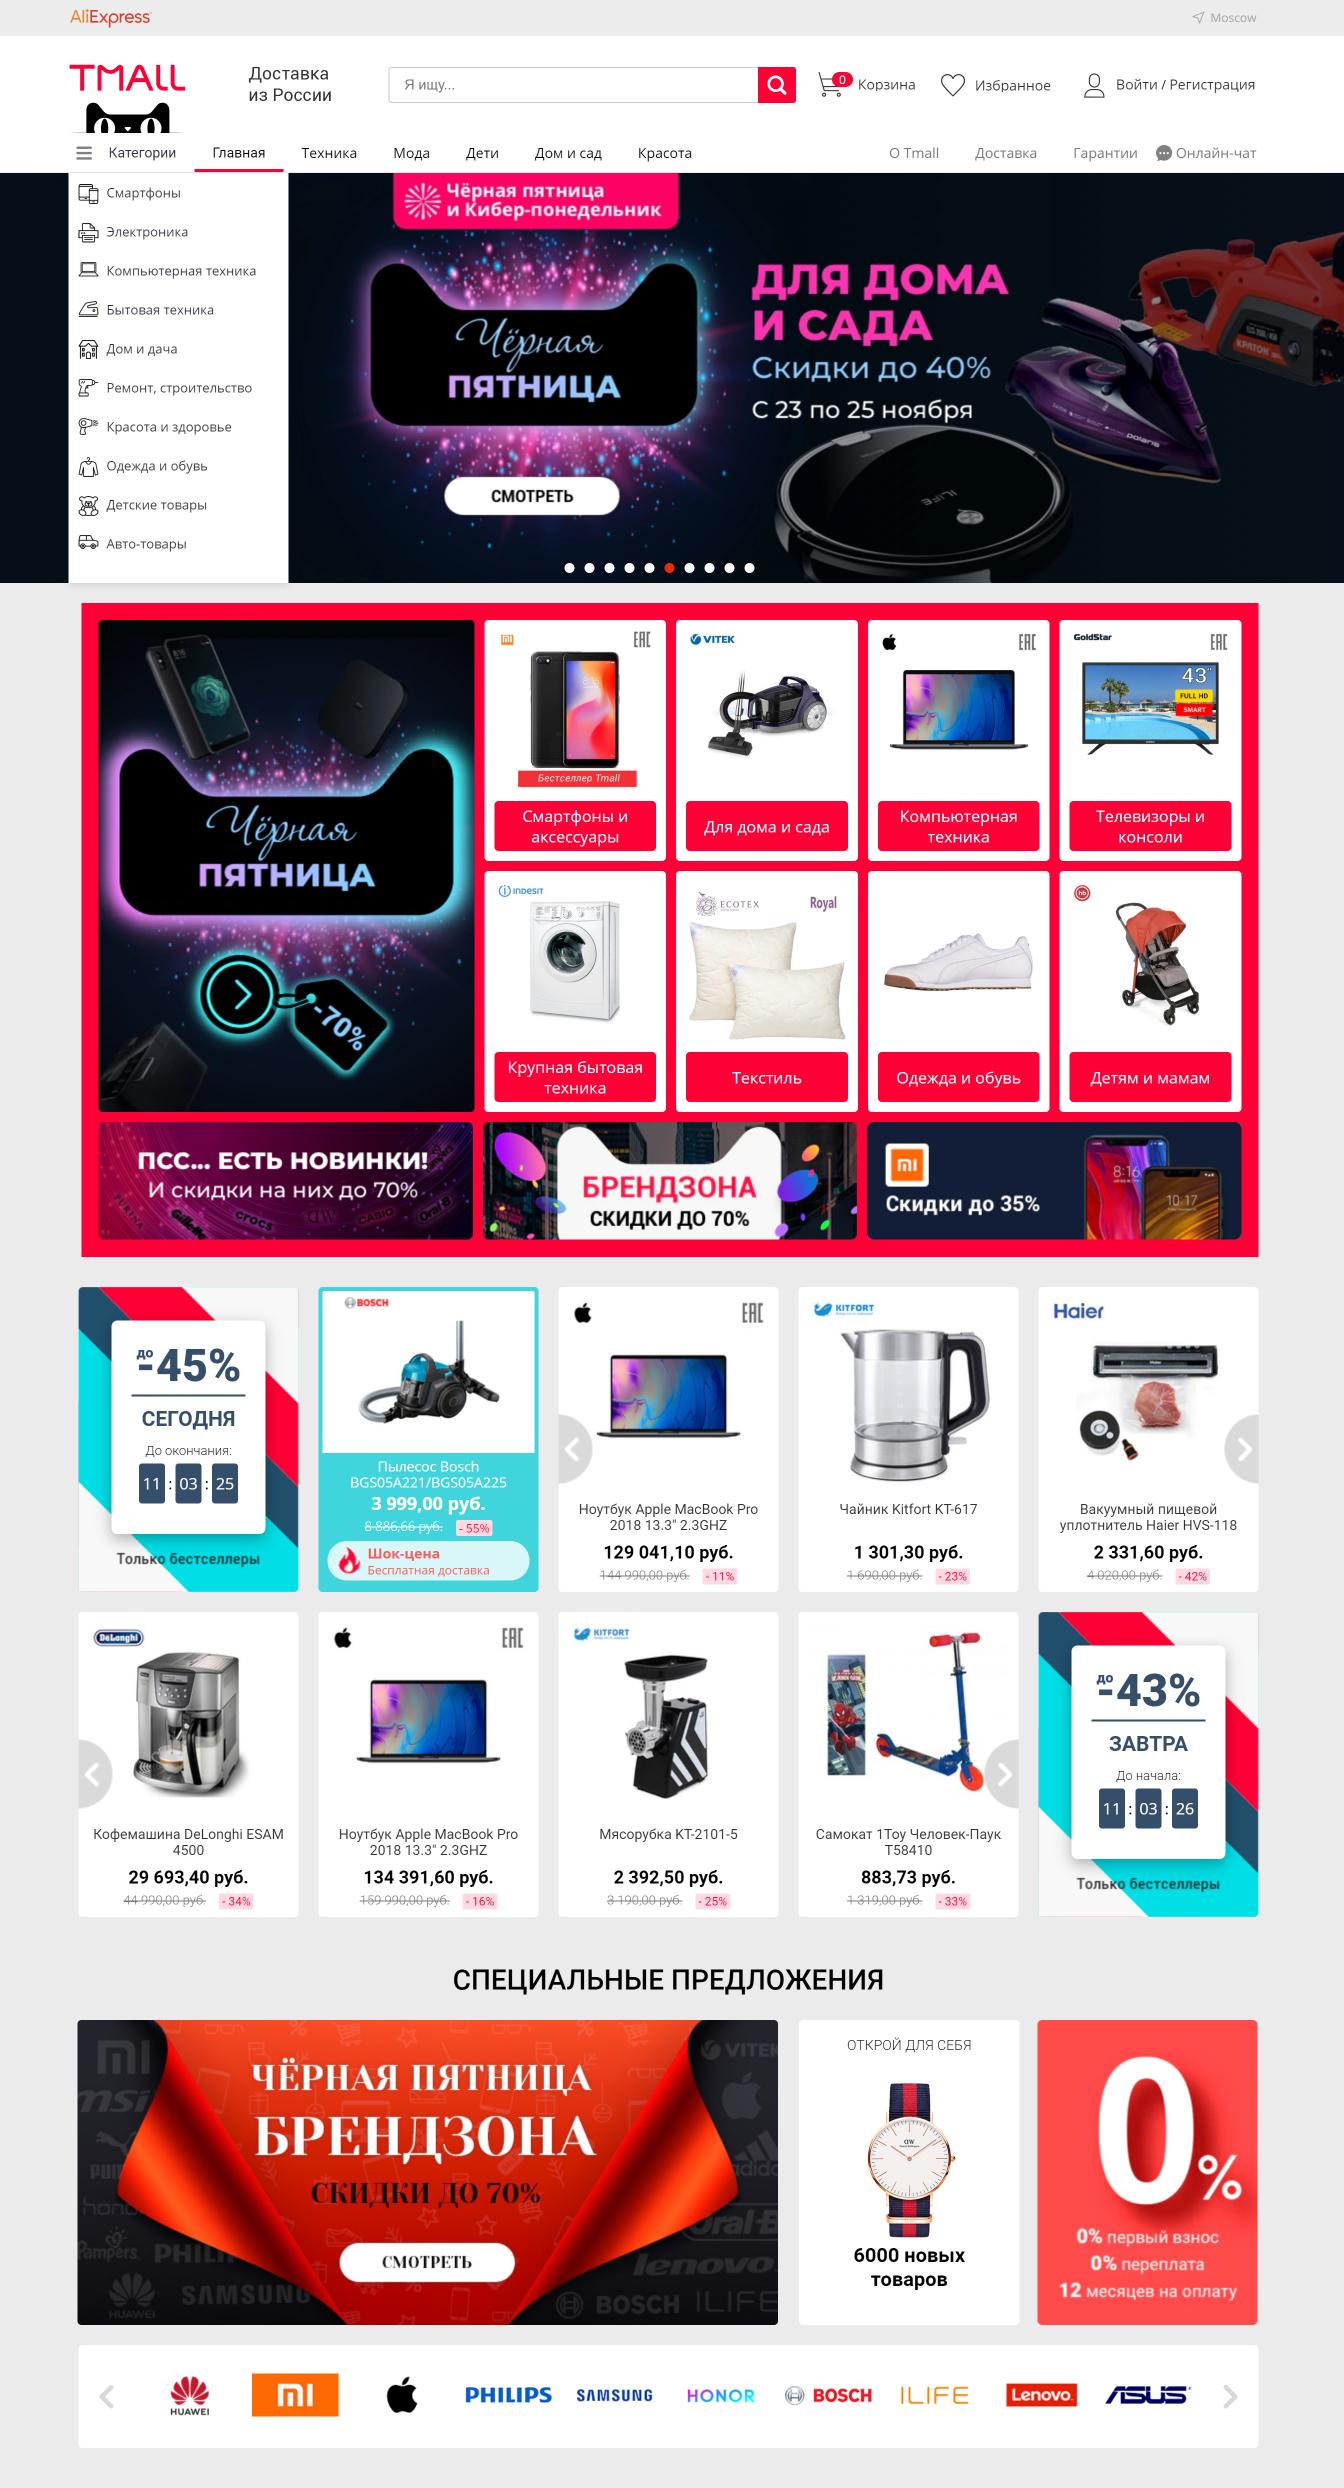 aa7c4f8167b3 Интернет-магазин Tmall на AliExpress: распродажа 11.11 и новое ...